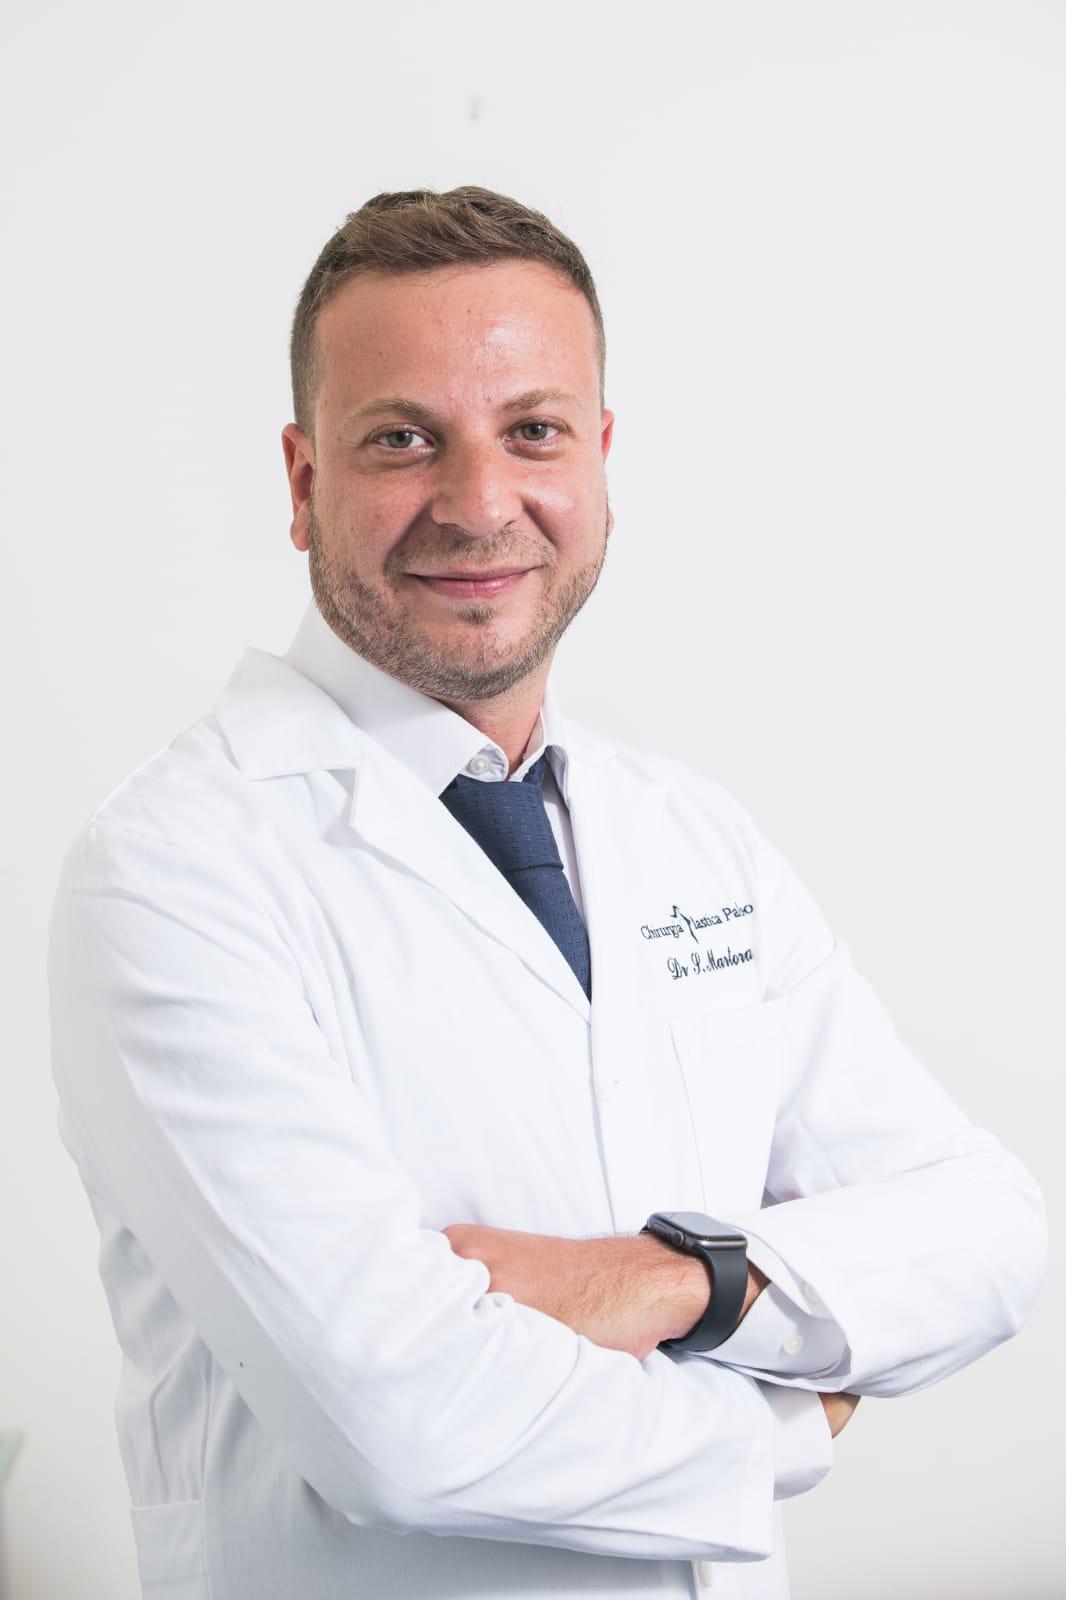 Dott Salvatore Martorana